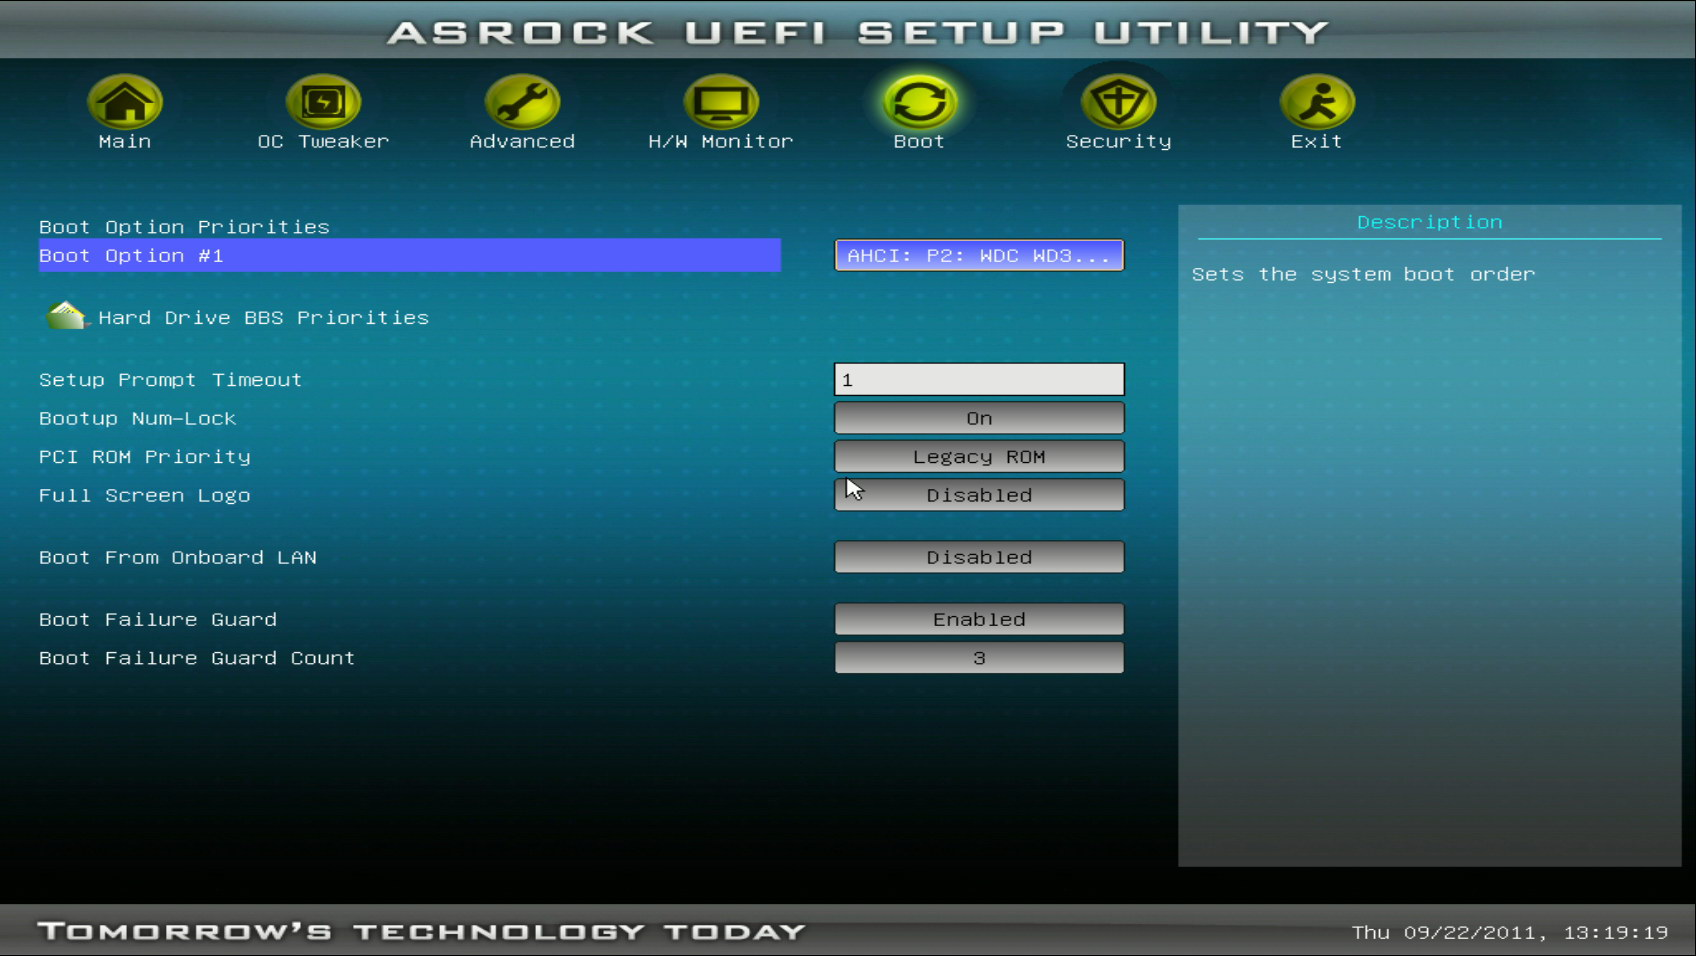 V-razdele-Boot-otobrazhajutsya-nastrojki-parametrov-zagruzki-PK.jpg